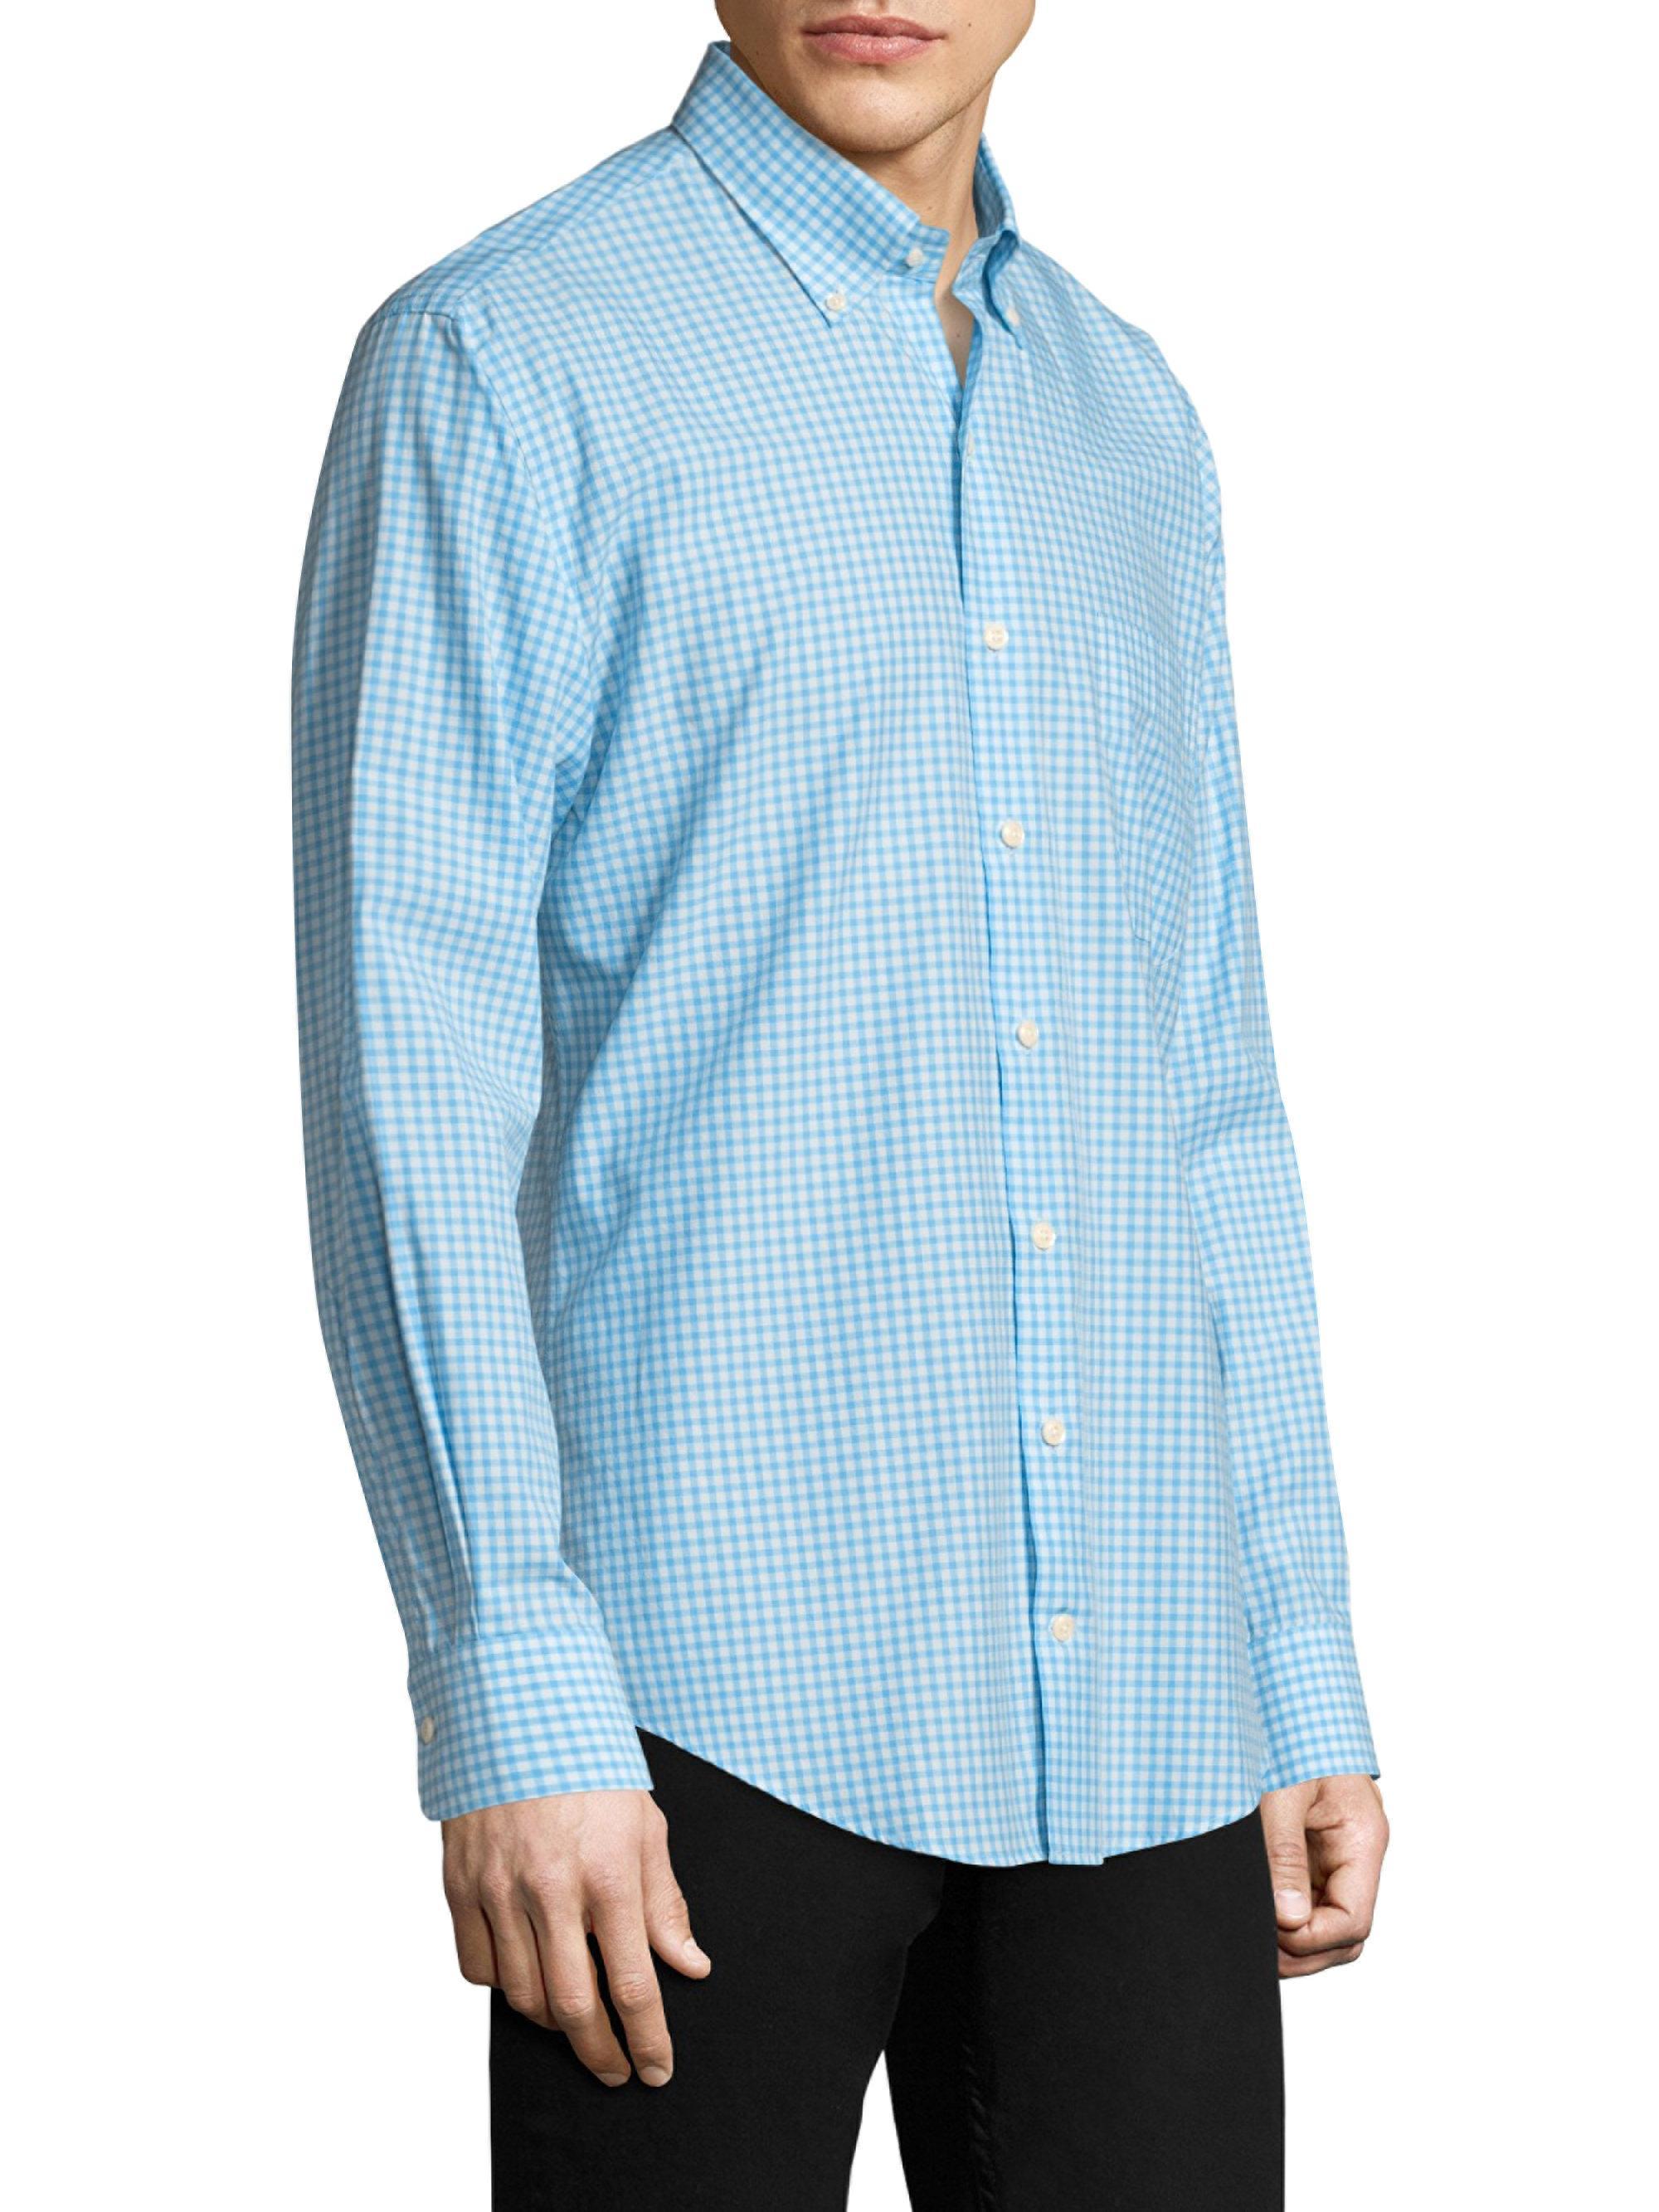 Lyst Peter Millar Checkered Cotton Button Down Shirt In